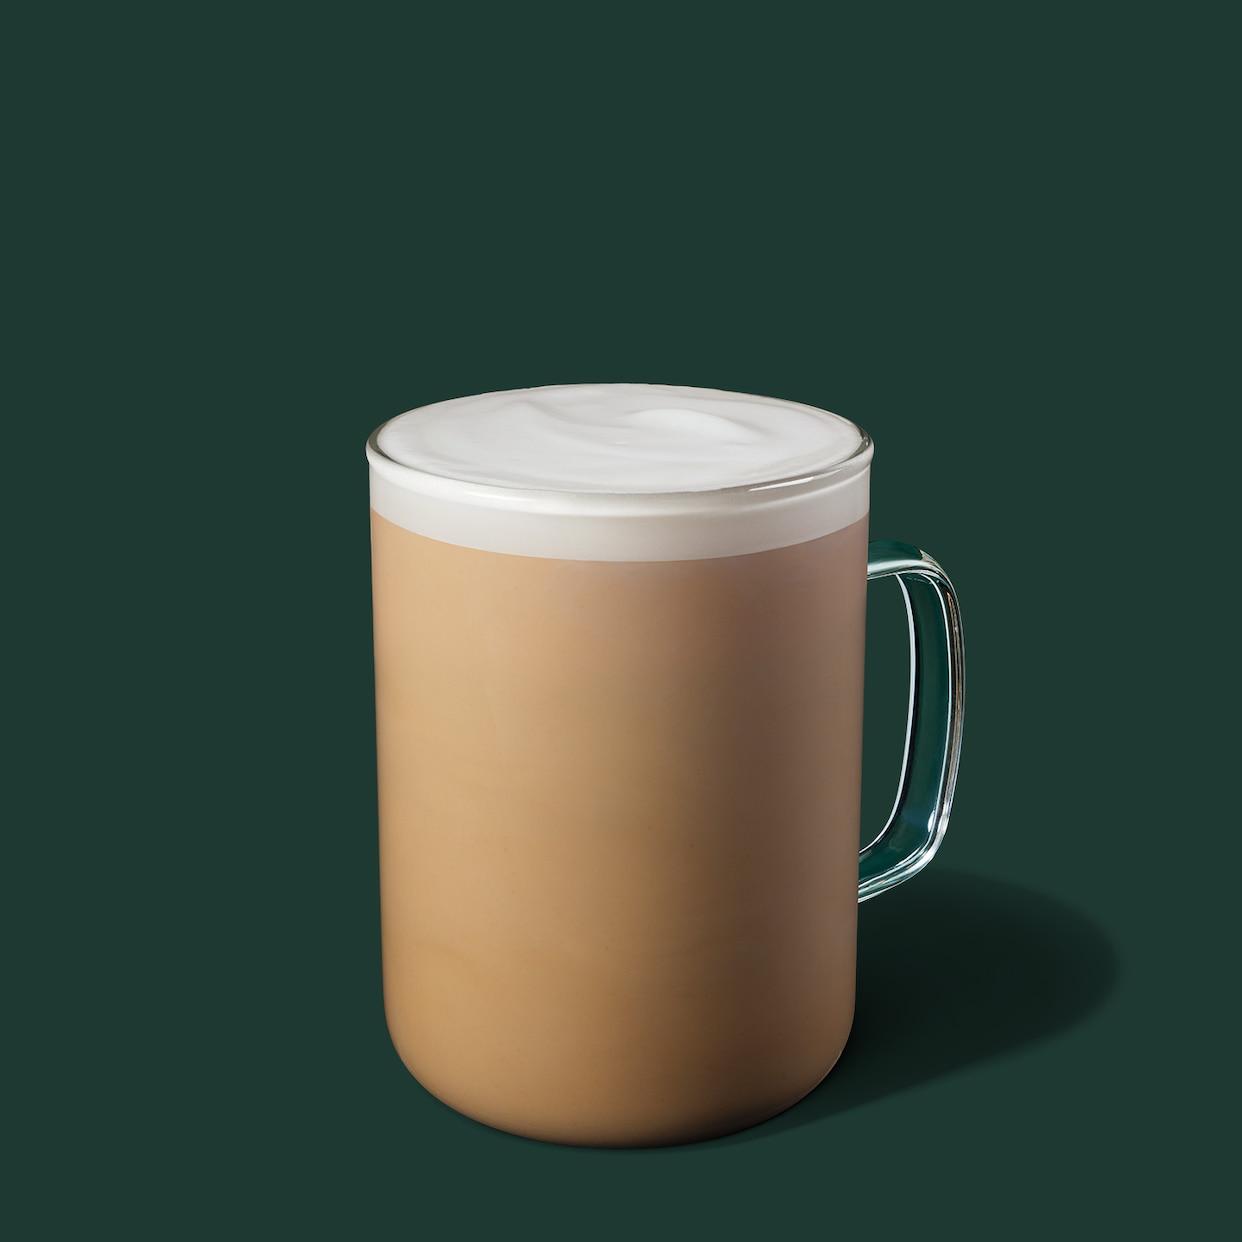 Chai Tea Latte Starbucks Coffee Company